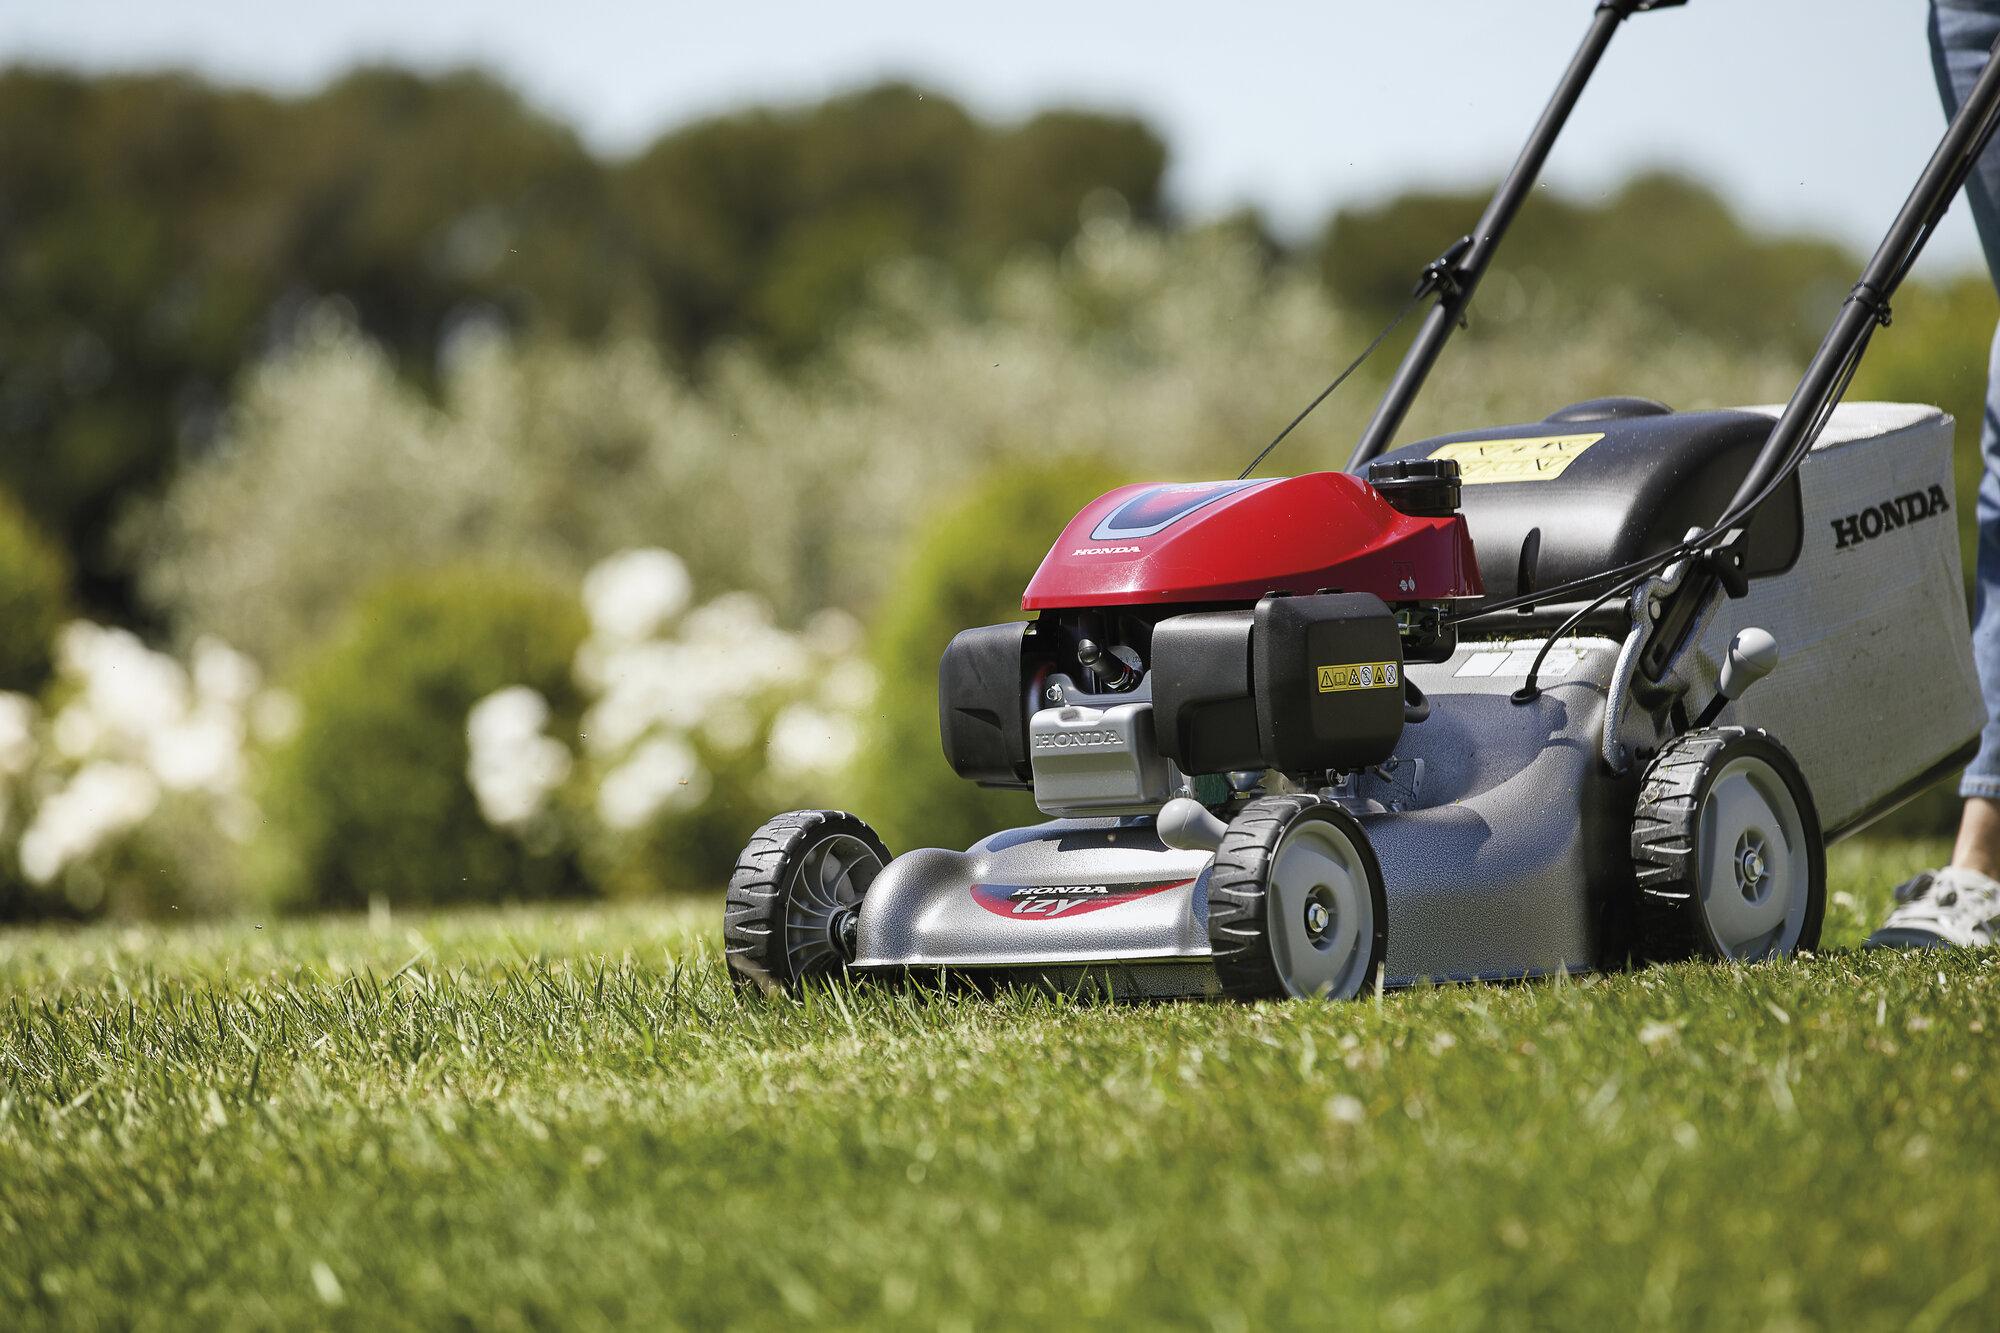 Motorová sekačka na trávu Honda HRG 416 C1 PKEH